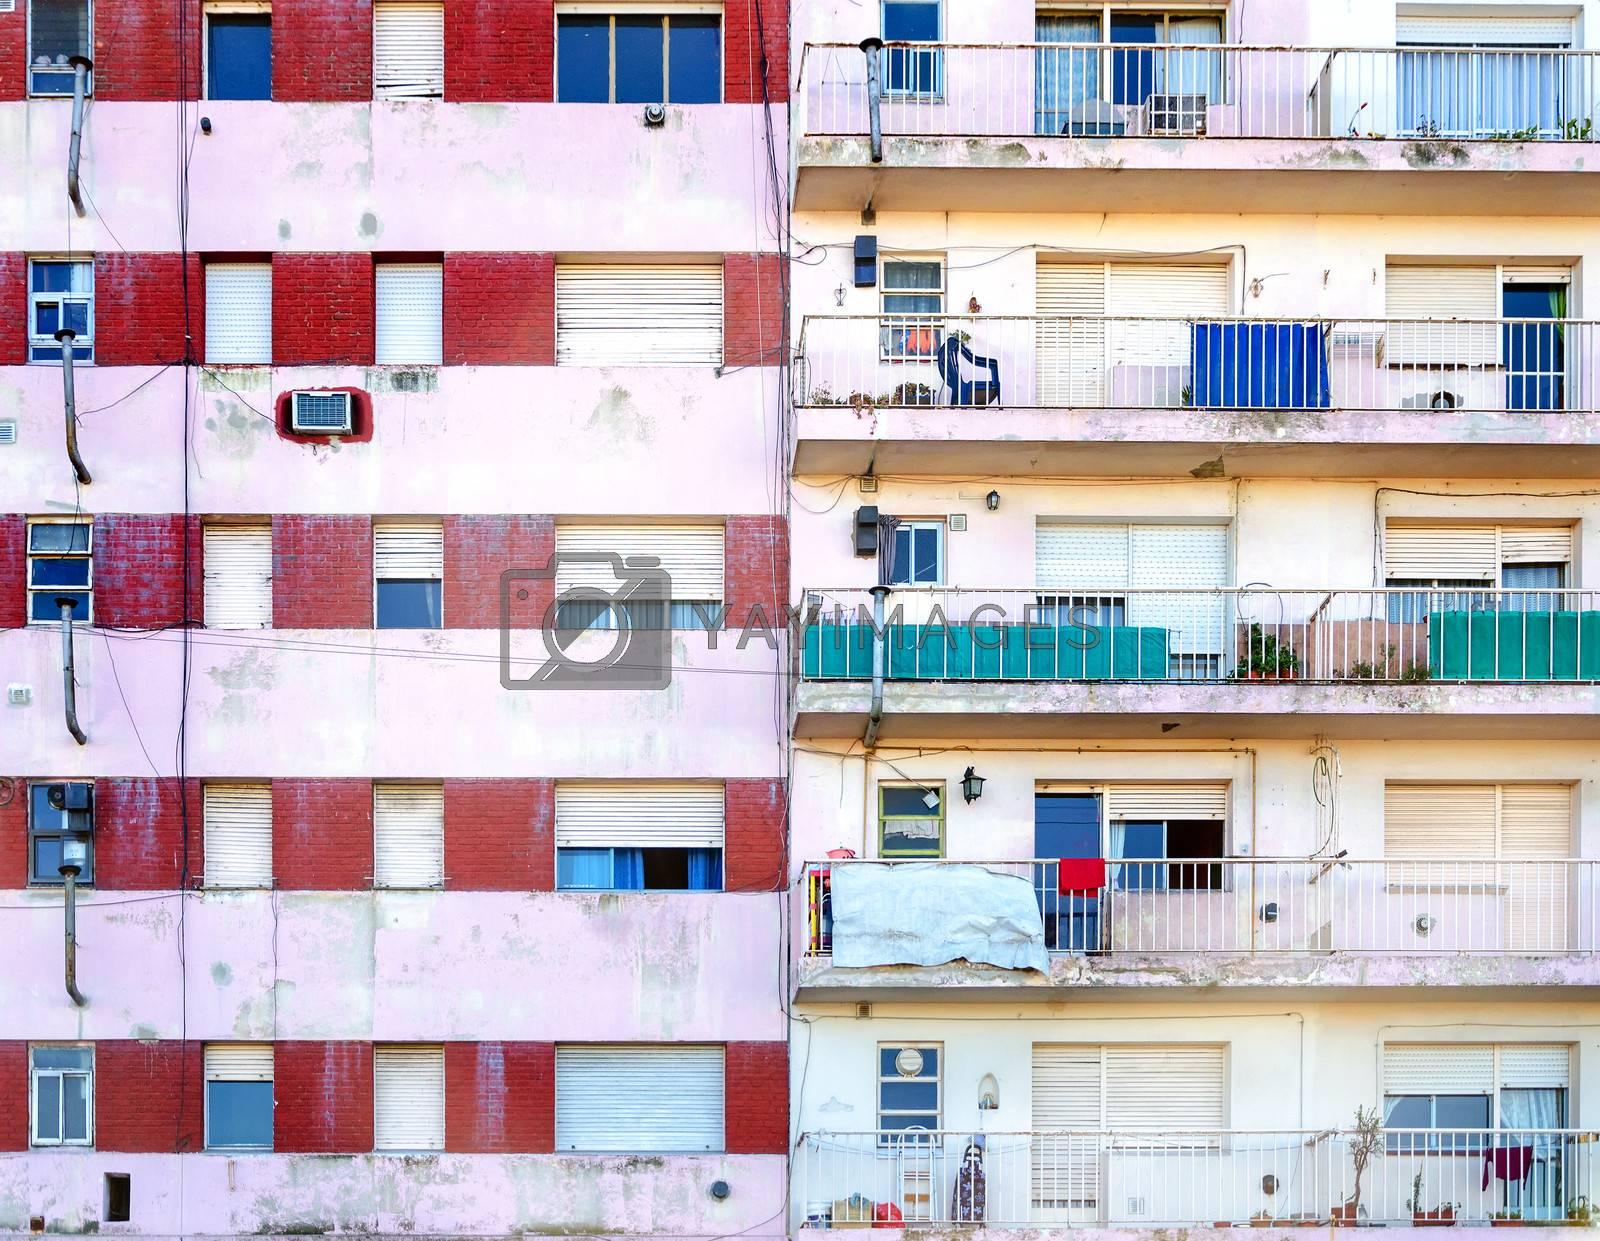 Facades of two poor apartment buildings in La Boca neighborhood of Buenos Aires